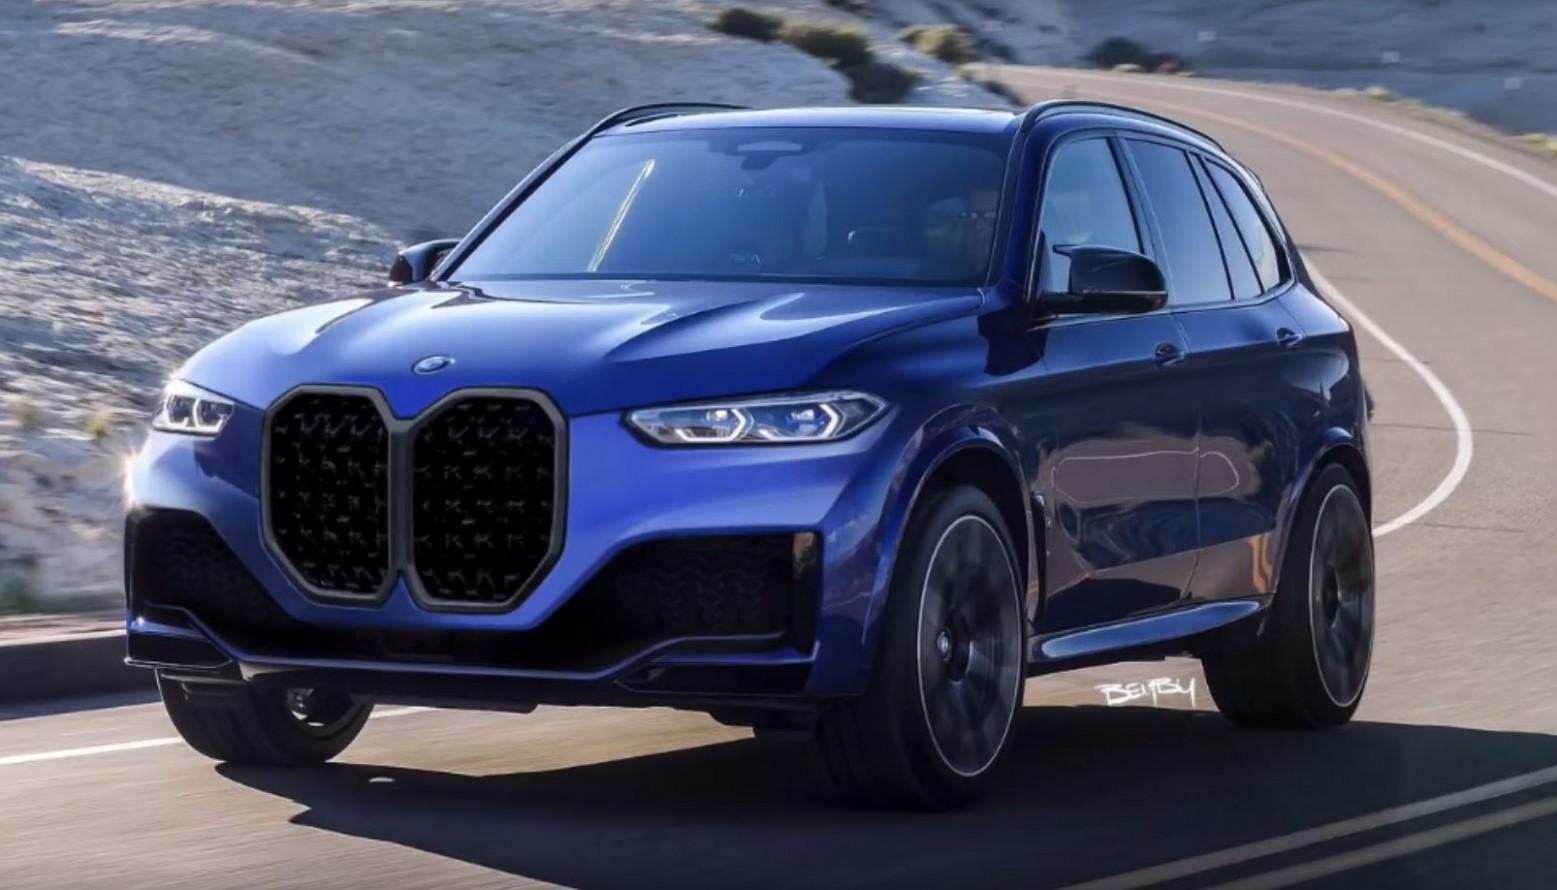 Style BMW Suv 2022